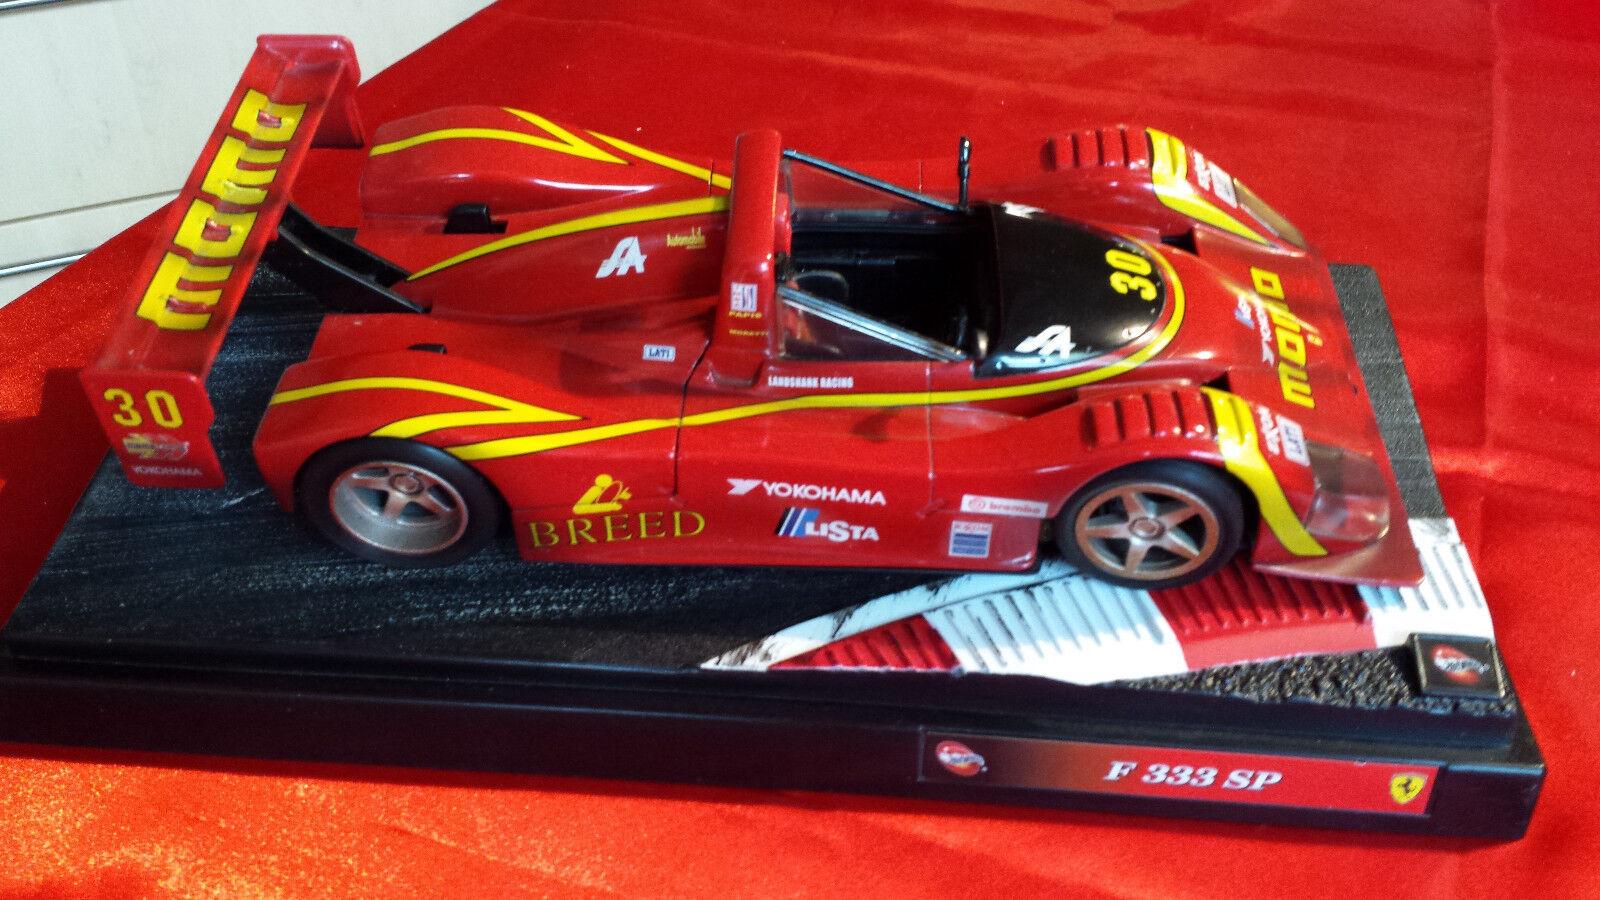 Ferrari F333 Sp 1998 1 18  MOMO  24 Std. Daytona  30  | Üppiges Design